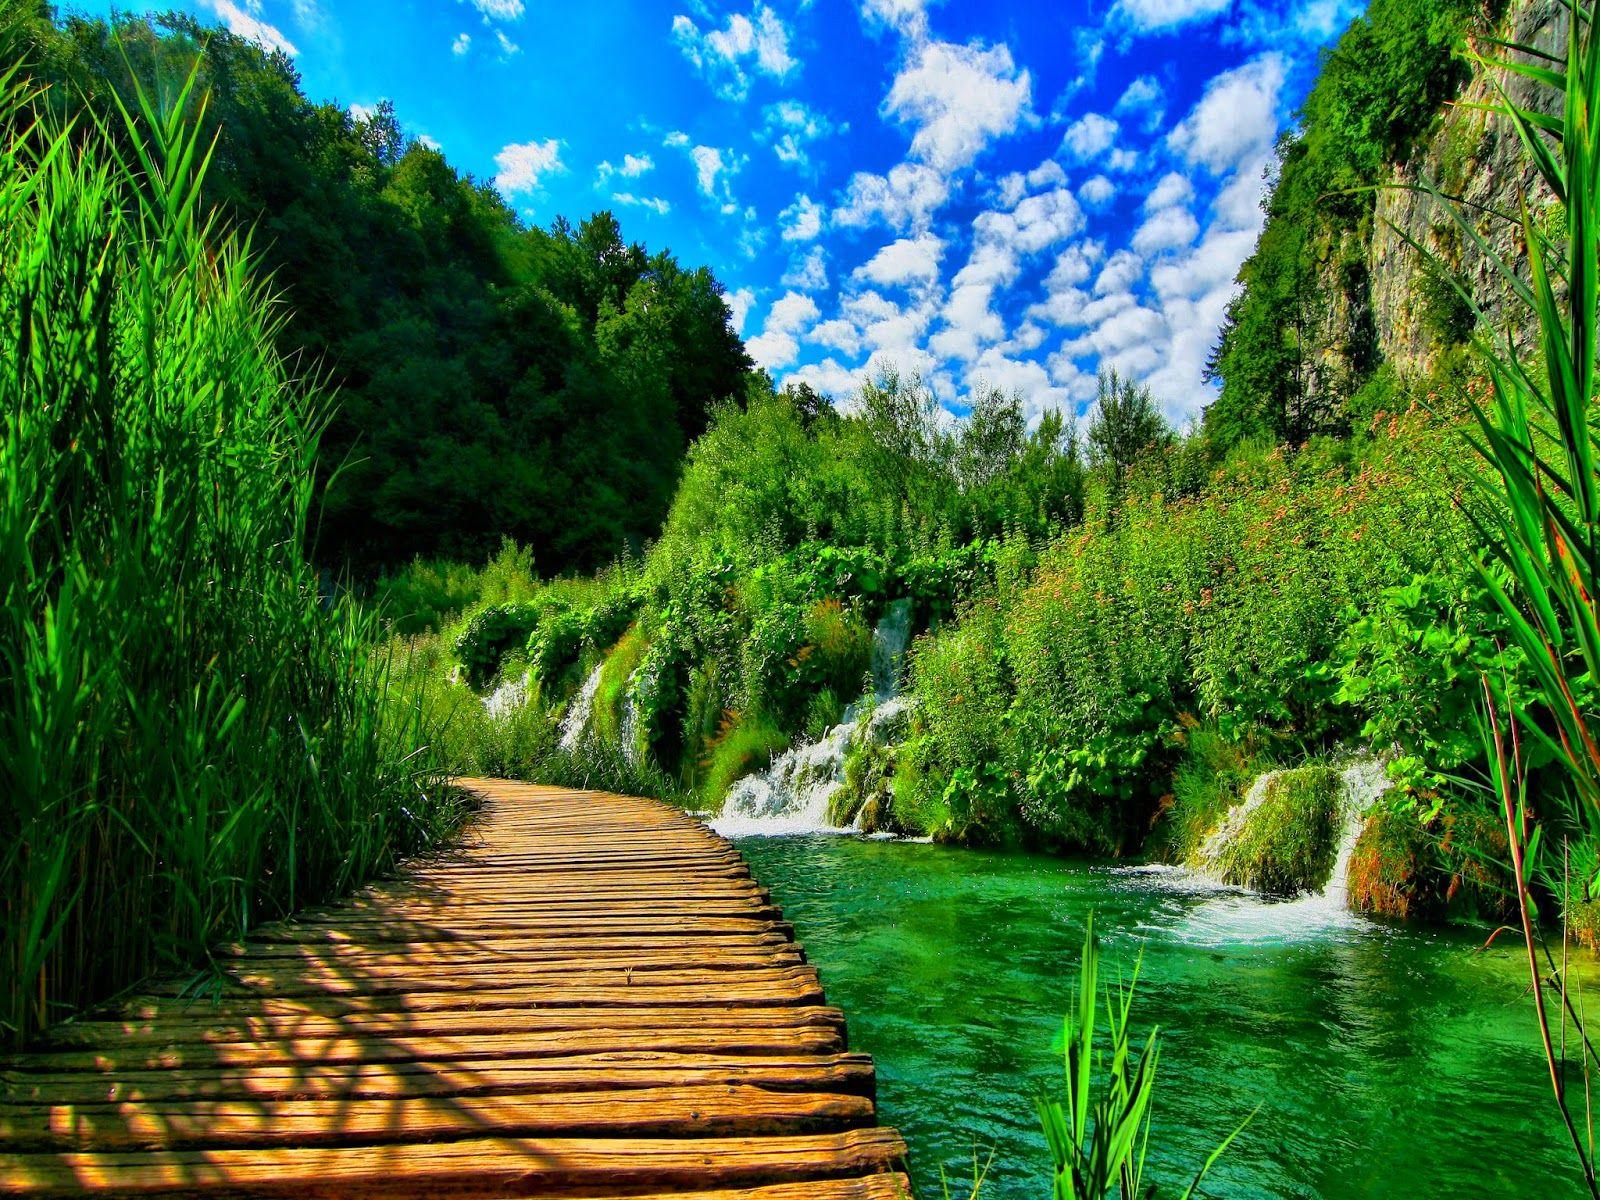 Hd wallpaper nature green - Green Nature Wallpaper Images Hd Desktop Mobile 8729832 Wallpaper